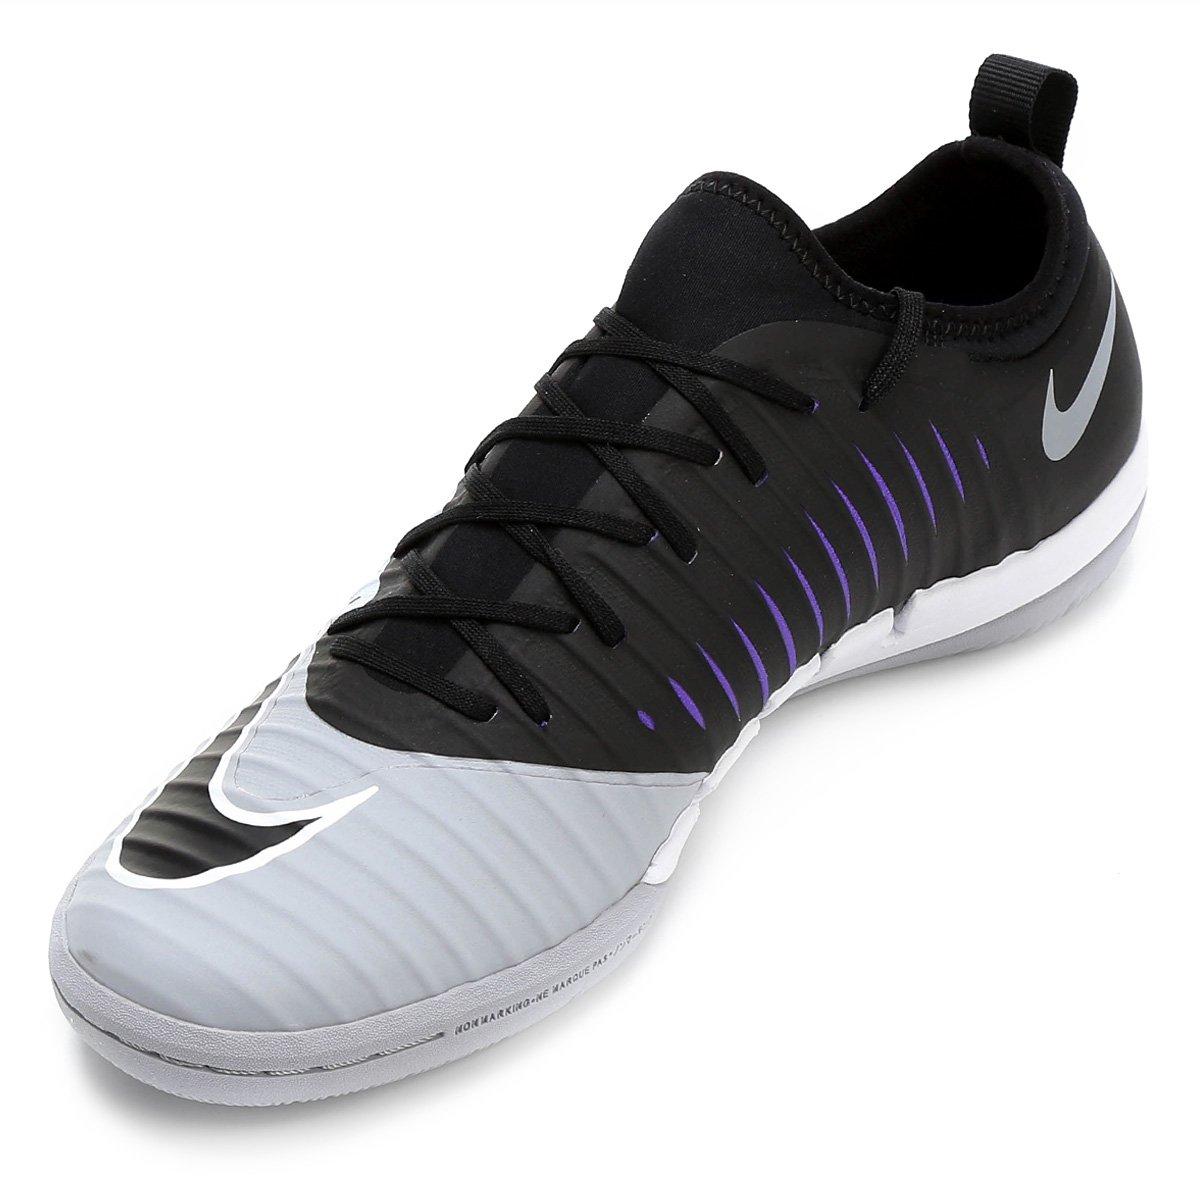 Chuteira Futsal Nike Mercurial Finale 2 IC Masculina - Compre Agora ... 701dd05d012f9